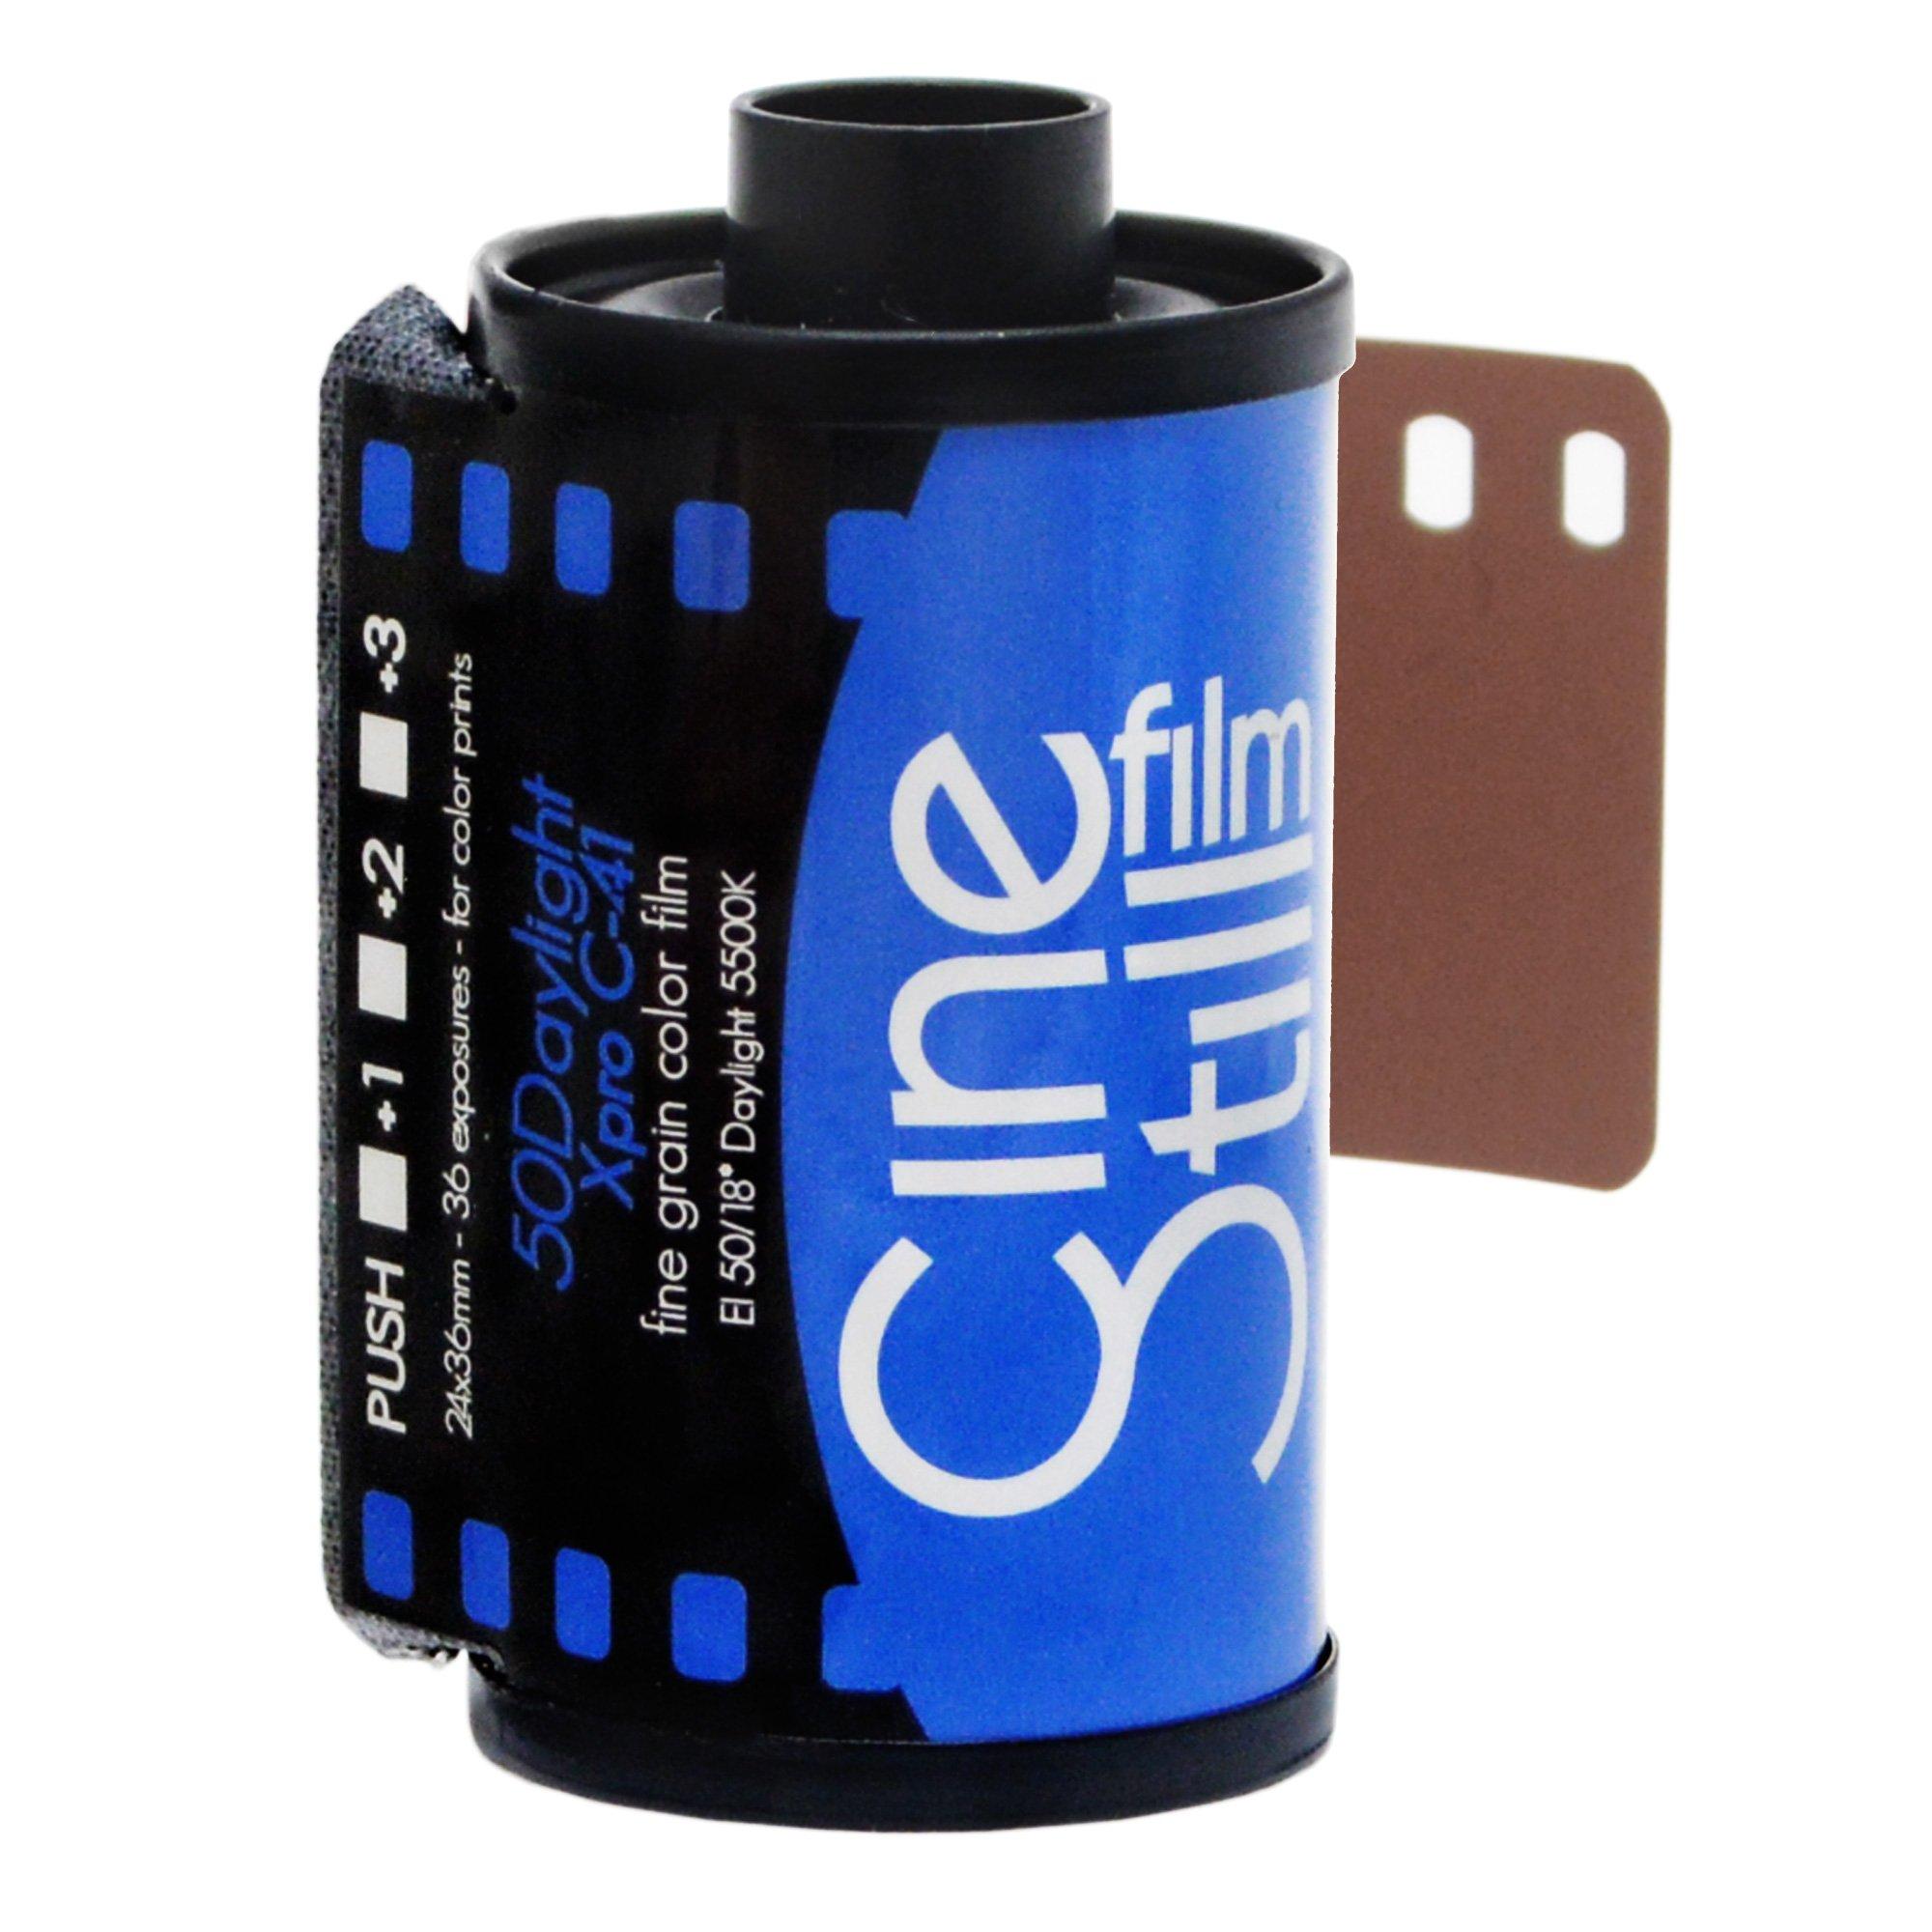 CineStill 800235 50Daylight Fine Grain Color Photographic Film 35 X 36